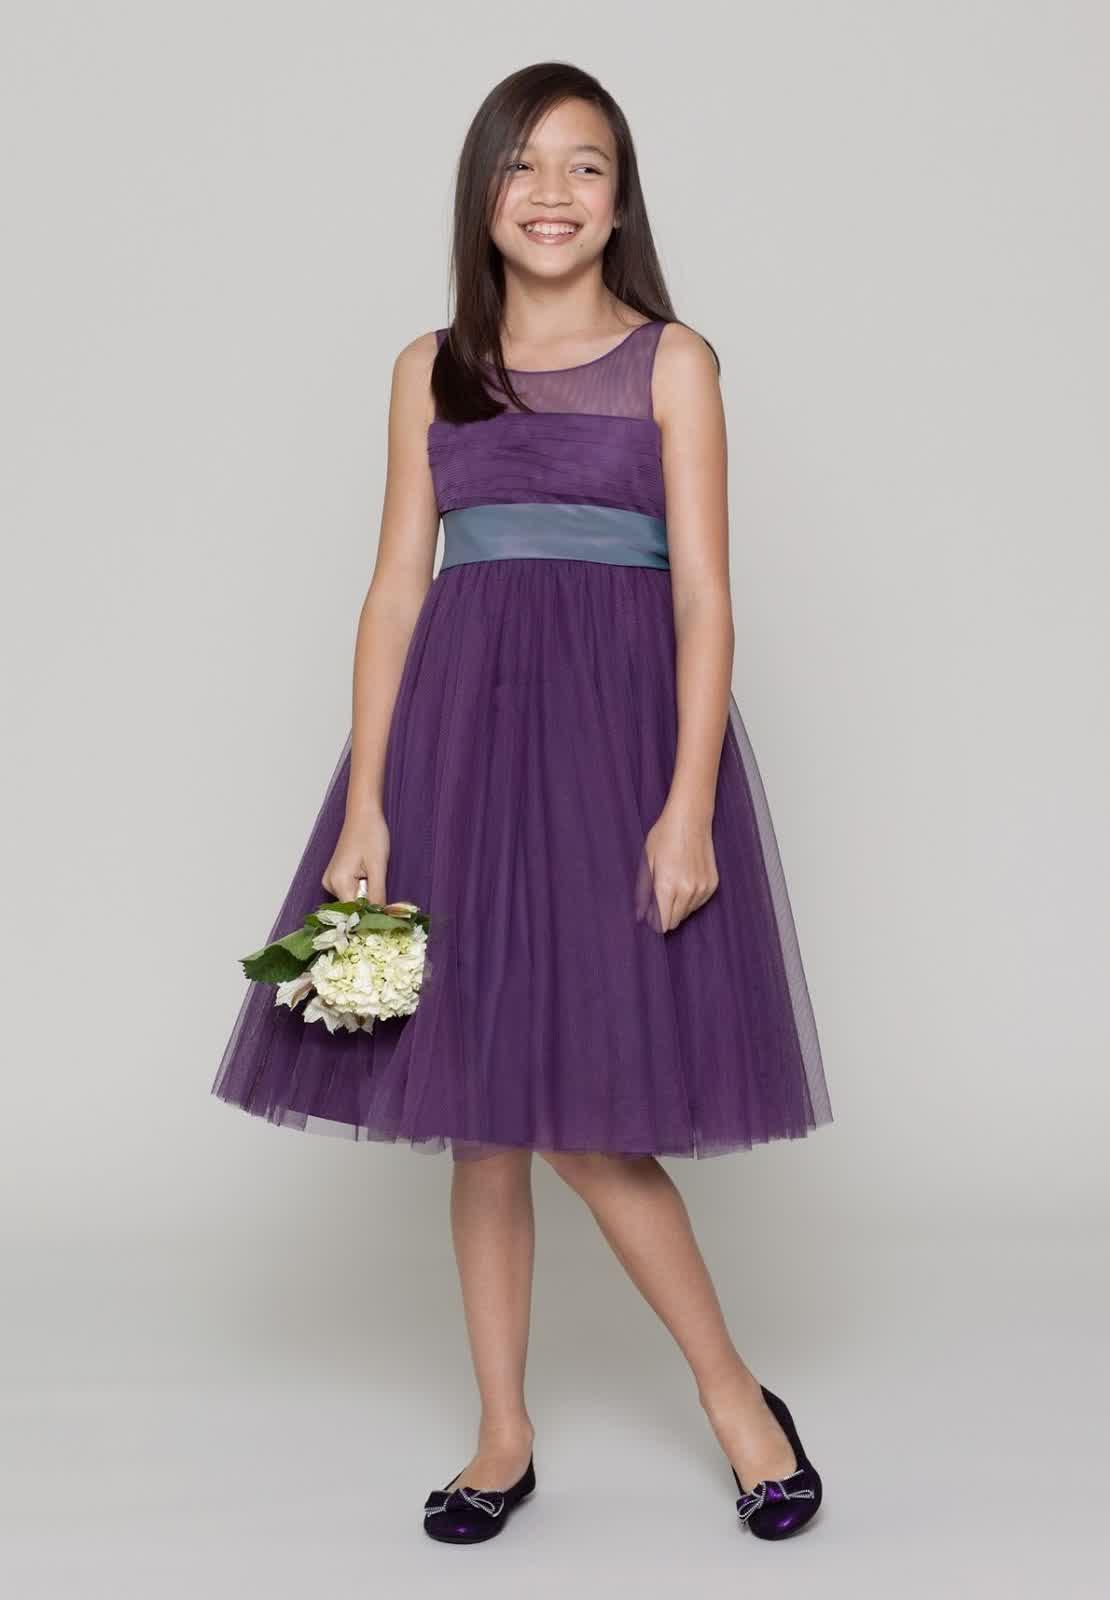 Wisteria Latest Junior Bridesmaid Dresses | bridal wedding trend